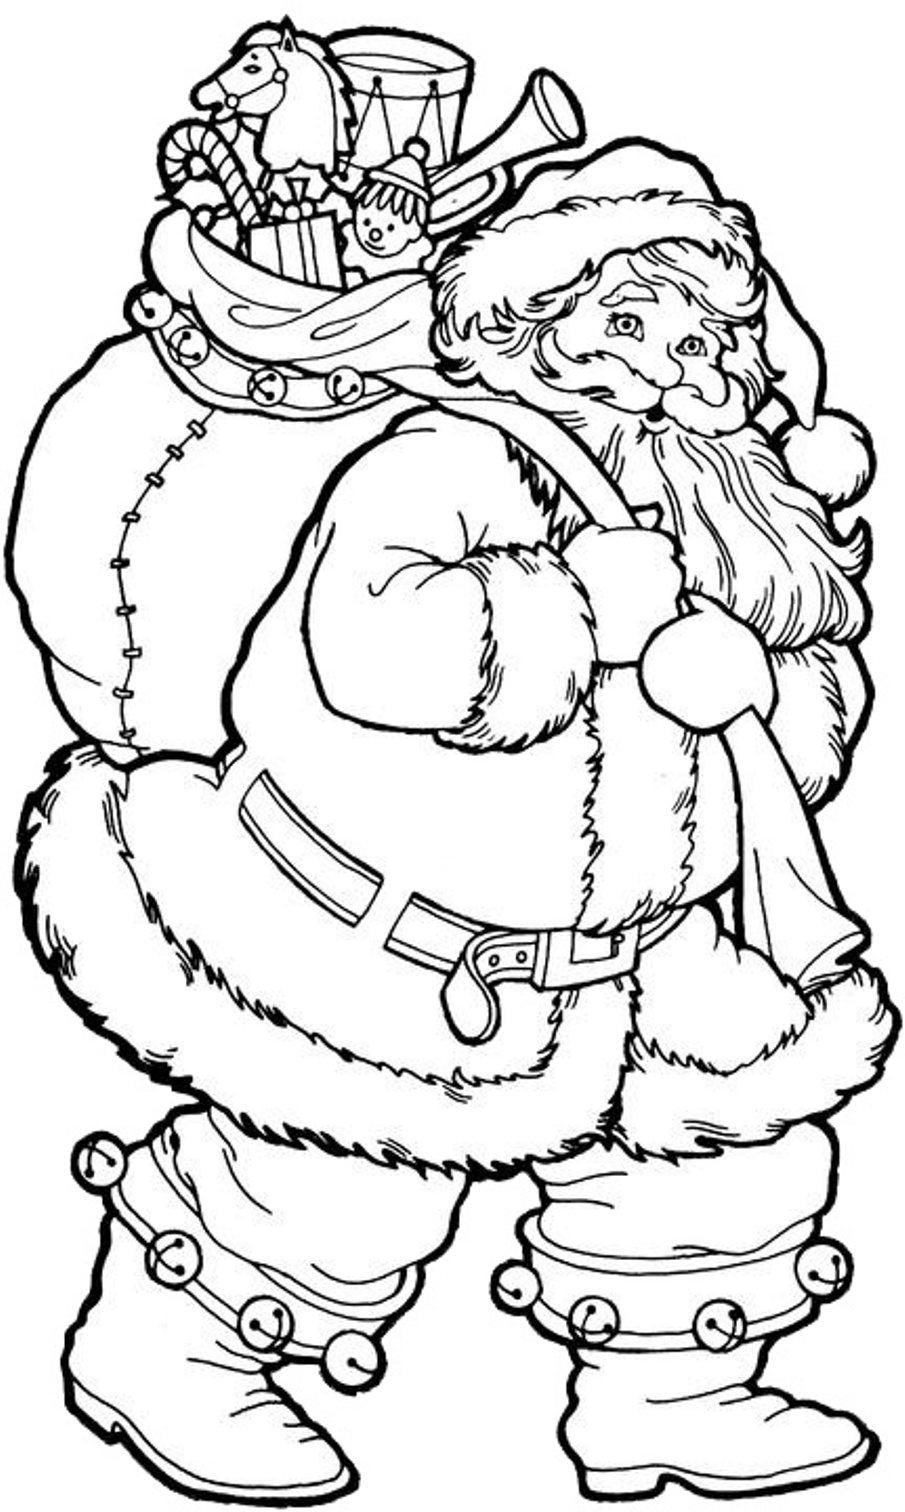 Christmas Coloring Pages Printable Santa With Big Presents